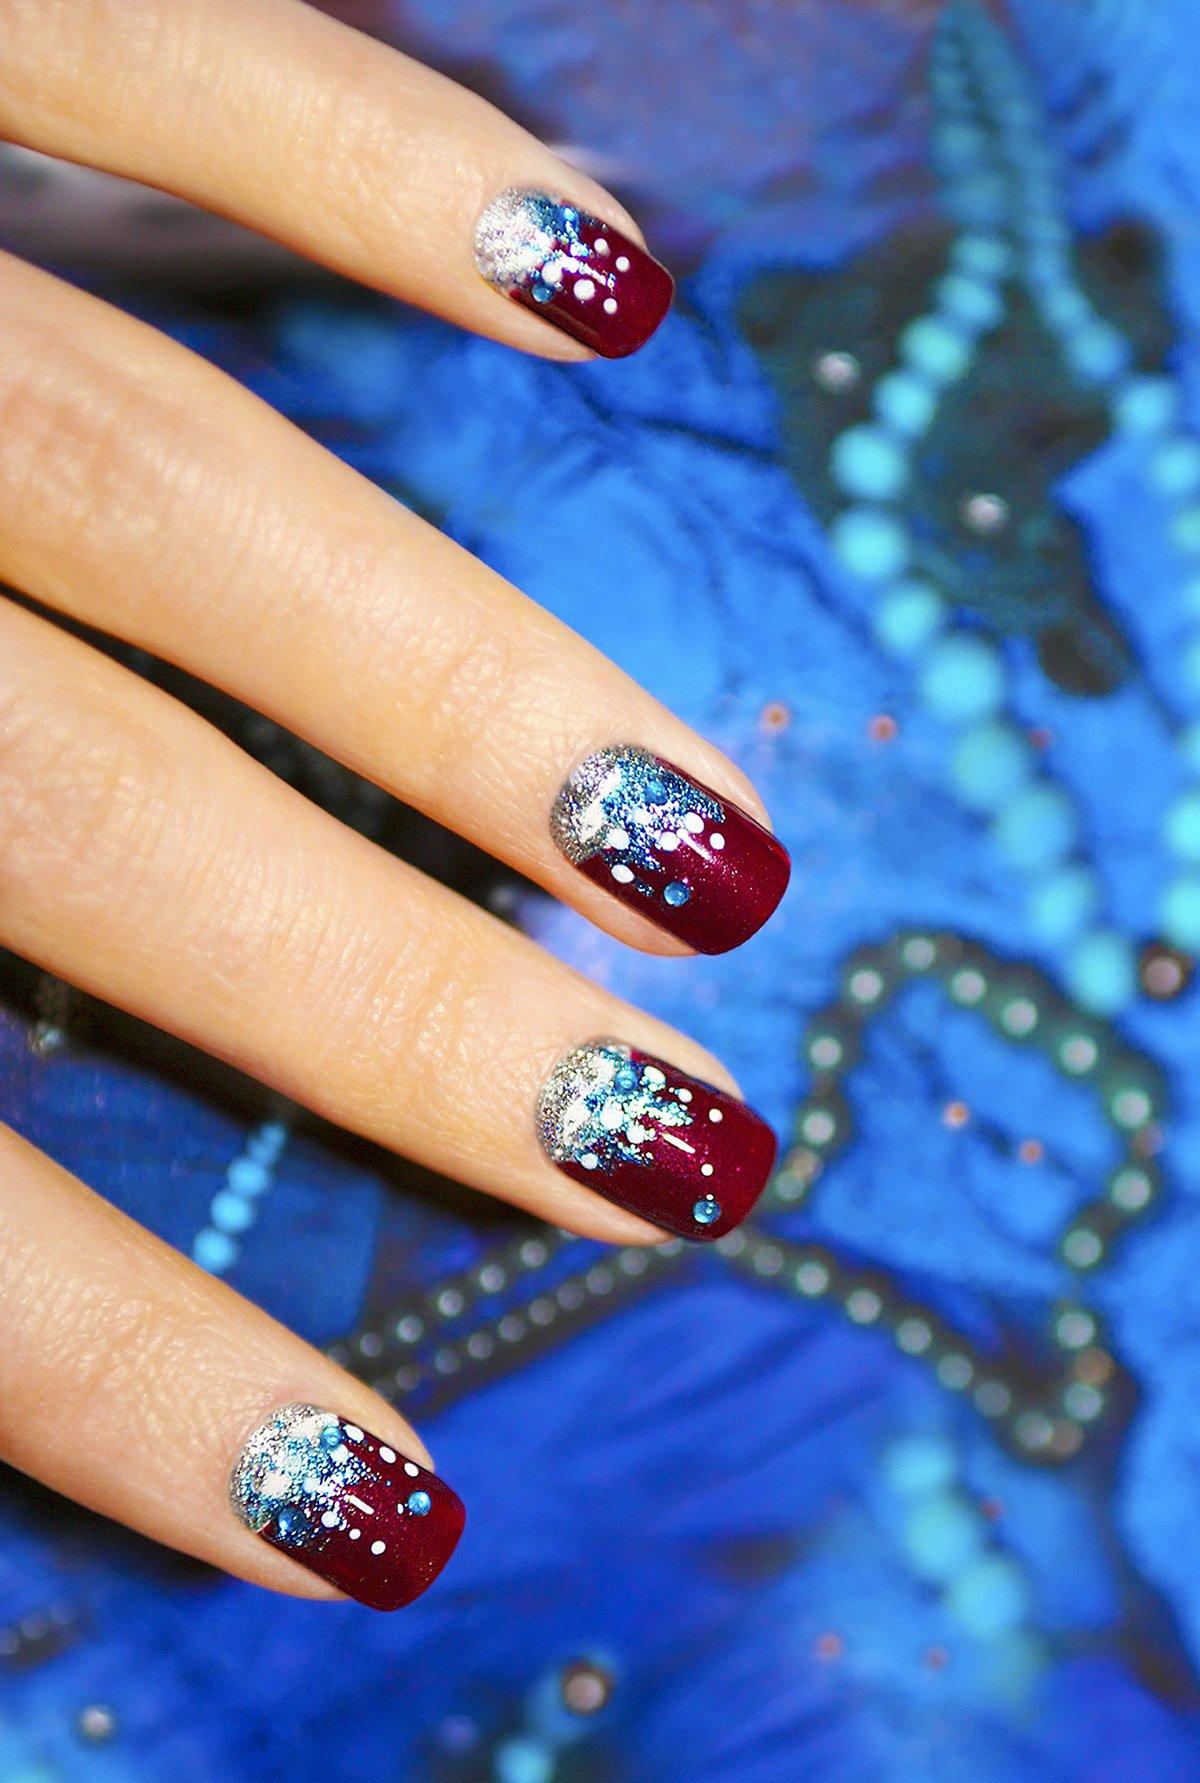 image4-122 | Модный дизайн ногтей — фото новинок маникюра 2018